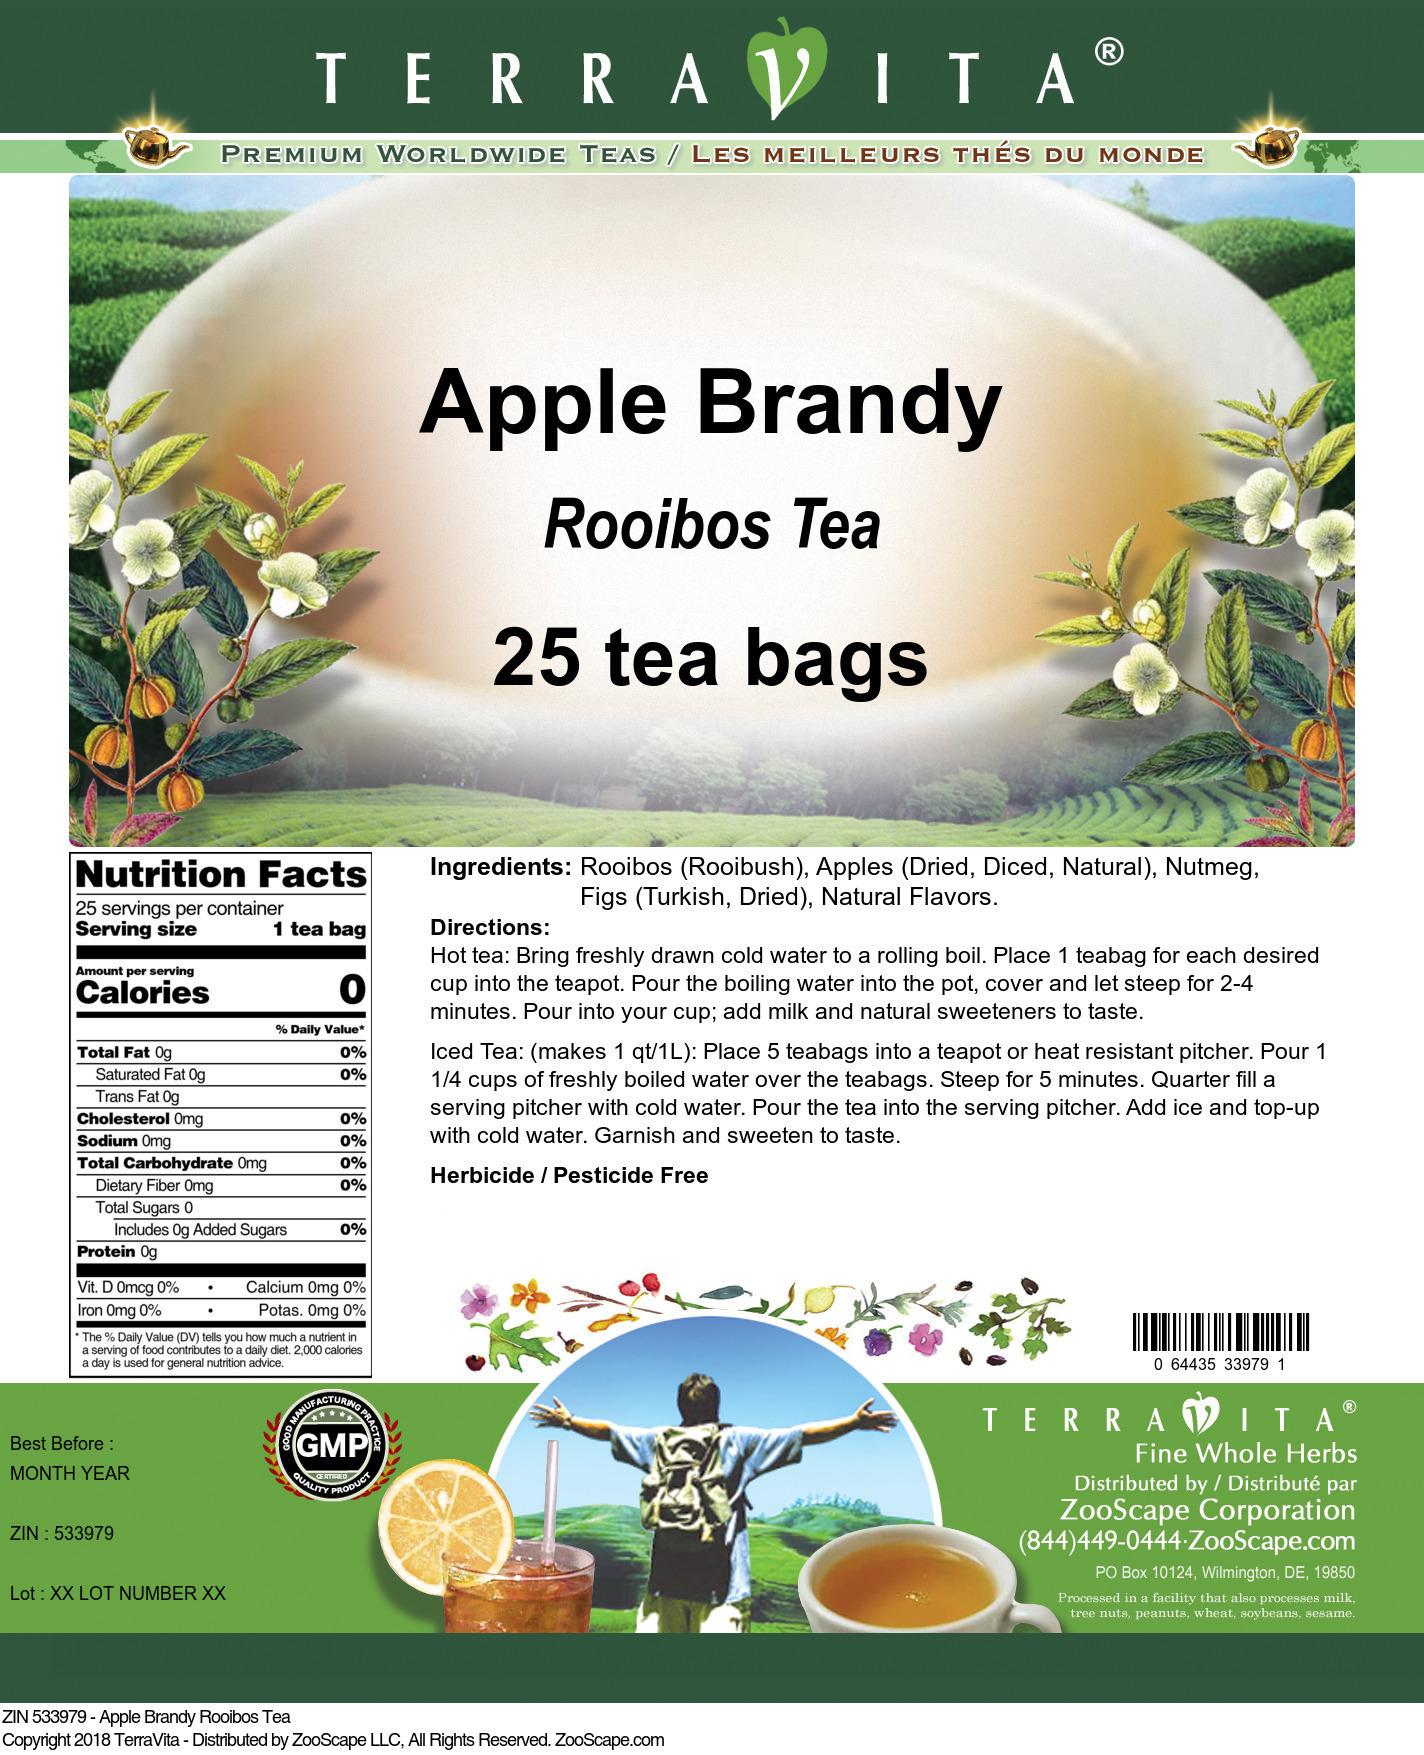 Apple Brandy Rooibos Tea